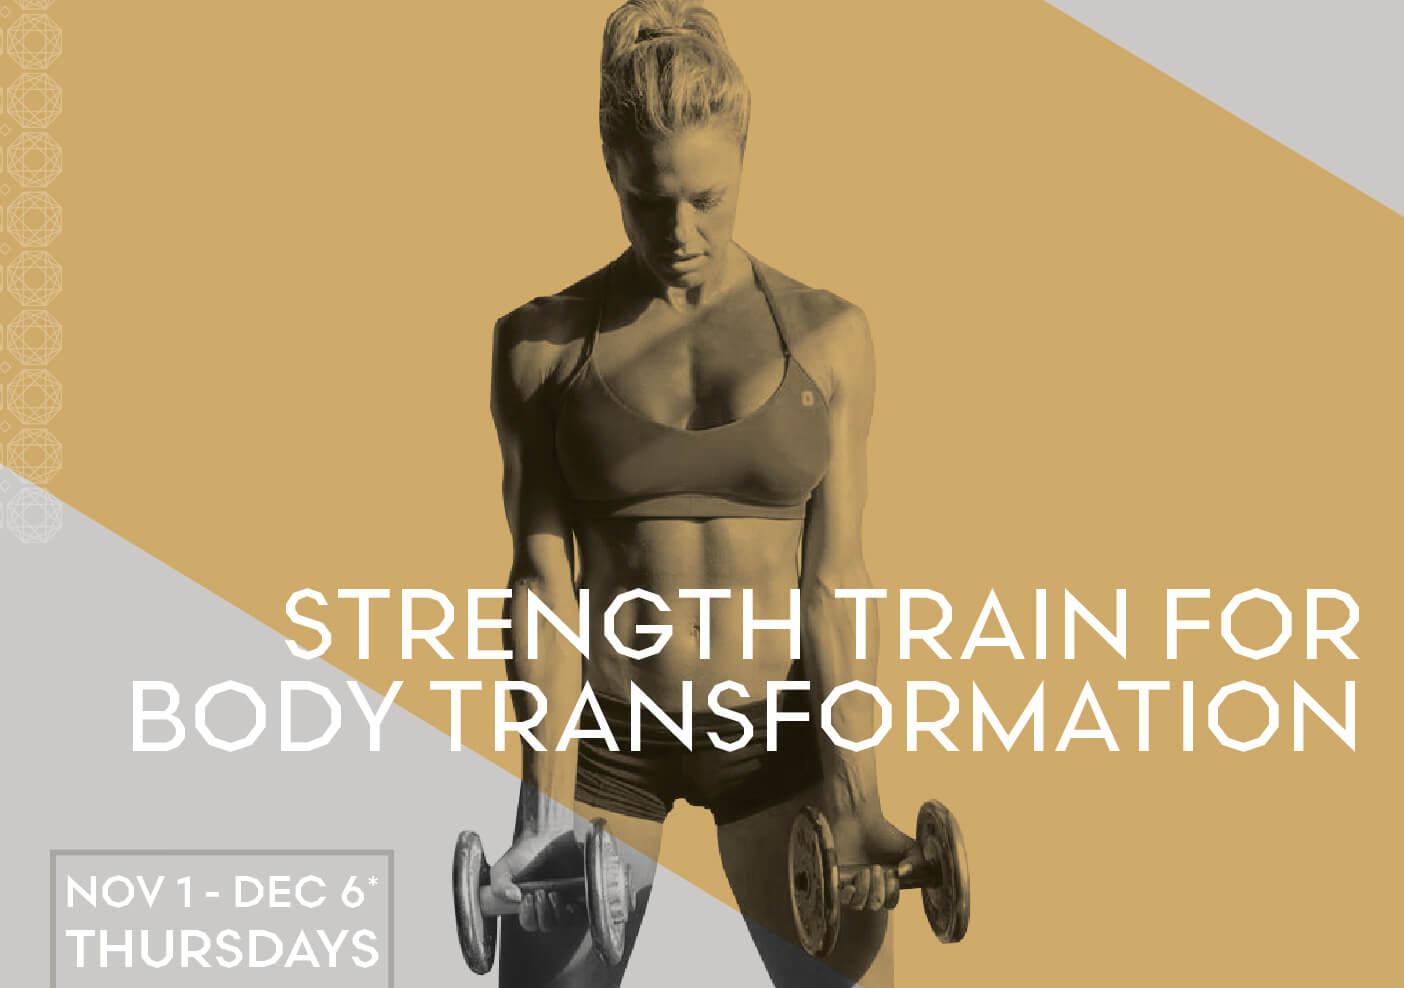 Strength Train for Body Transformation